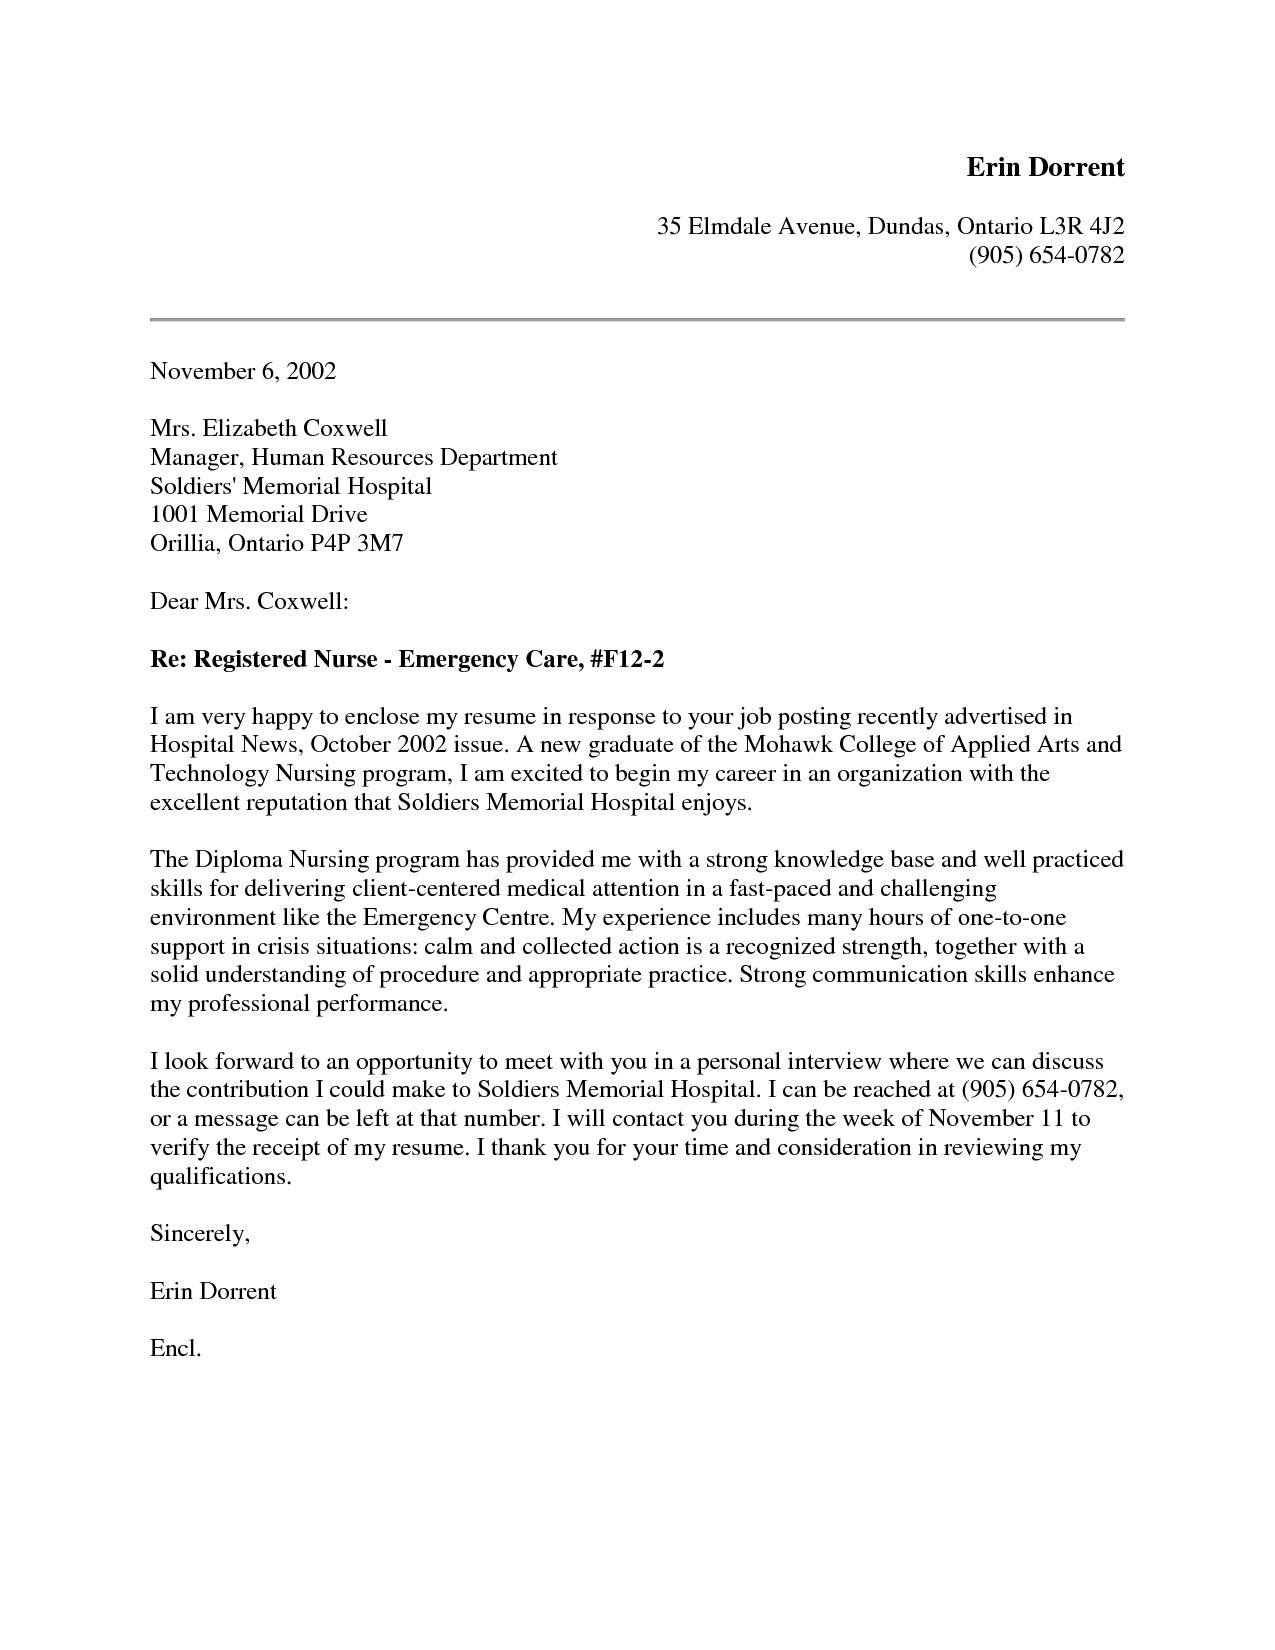 Cover Letter Examples Registered Nurse